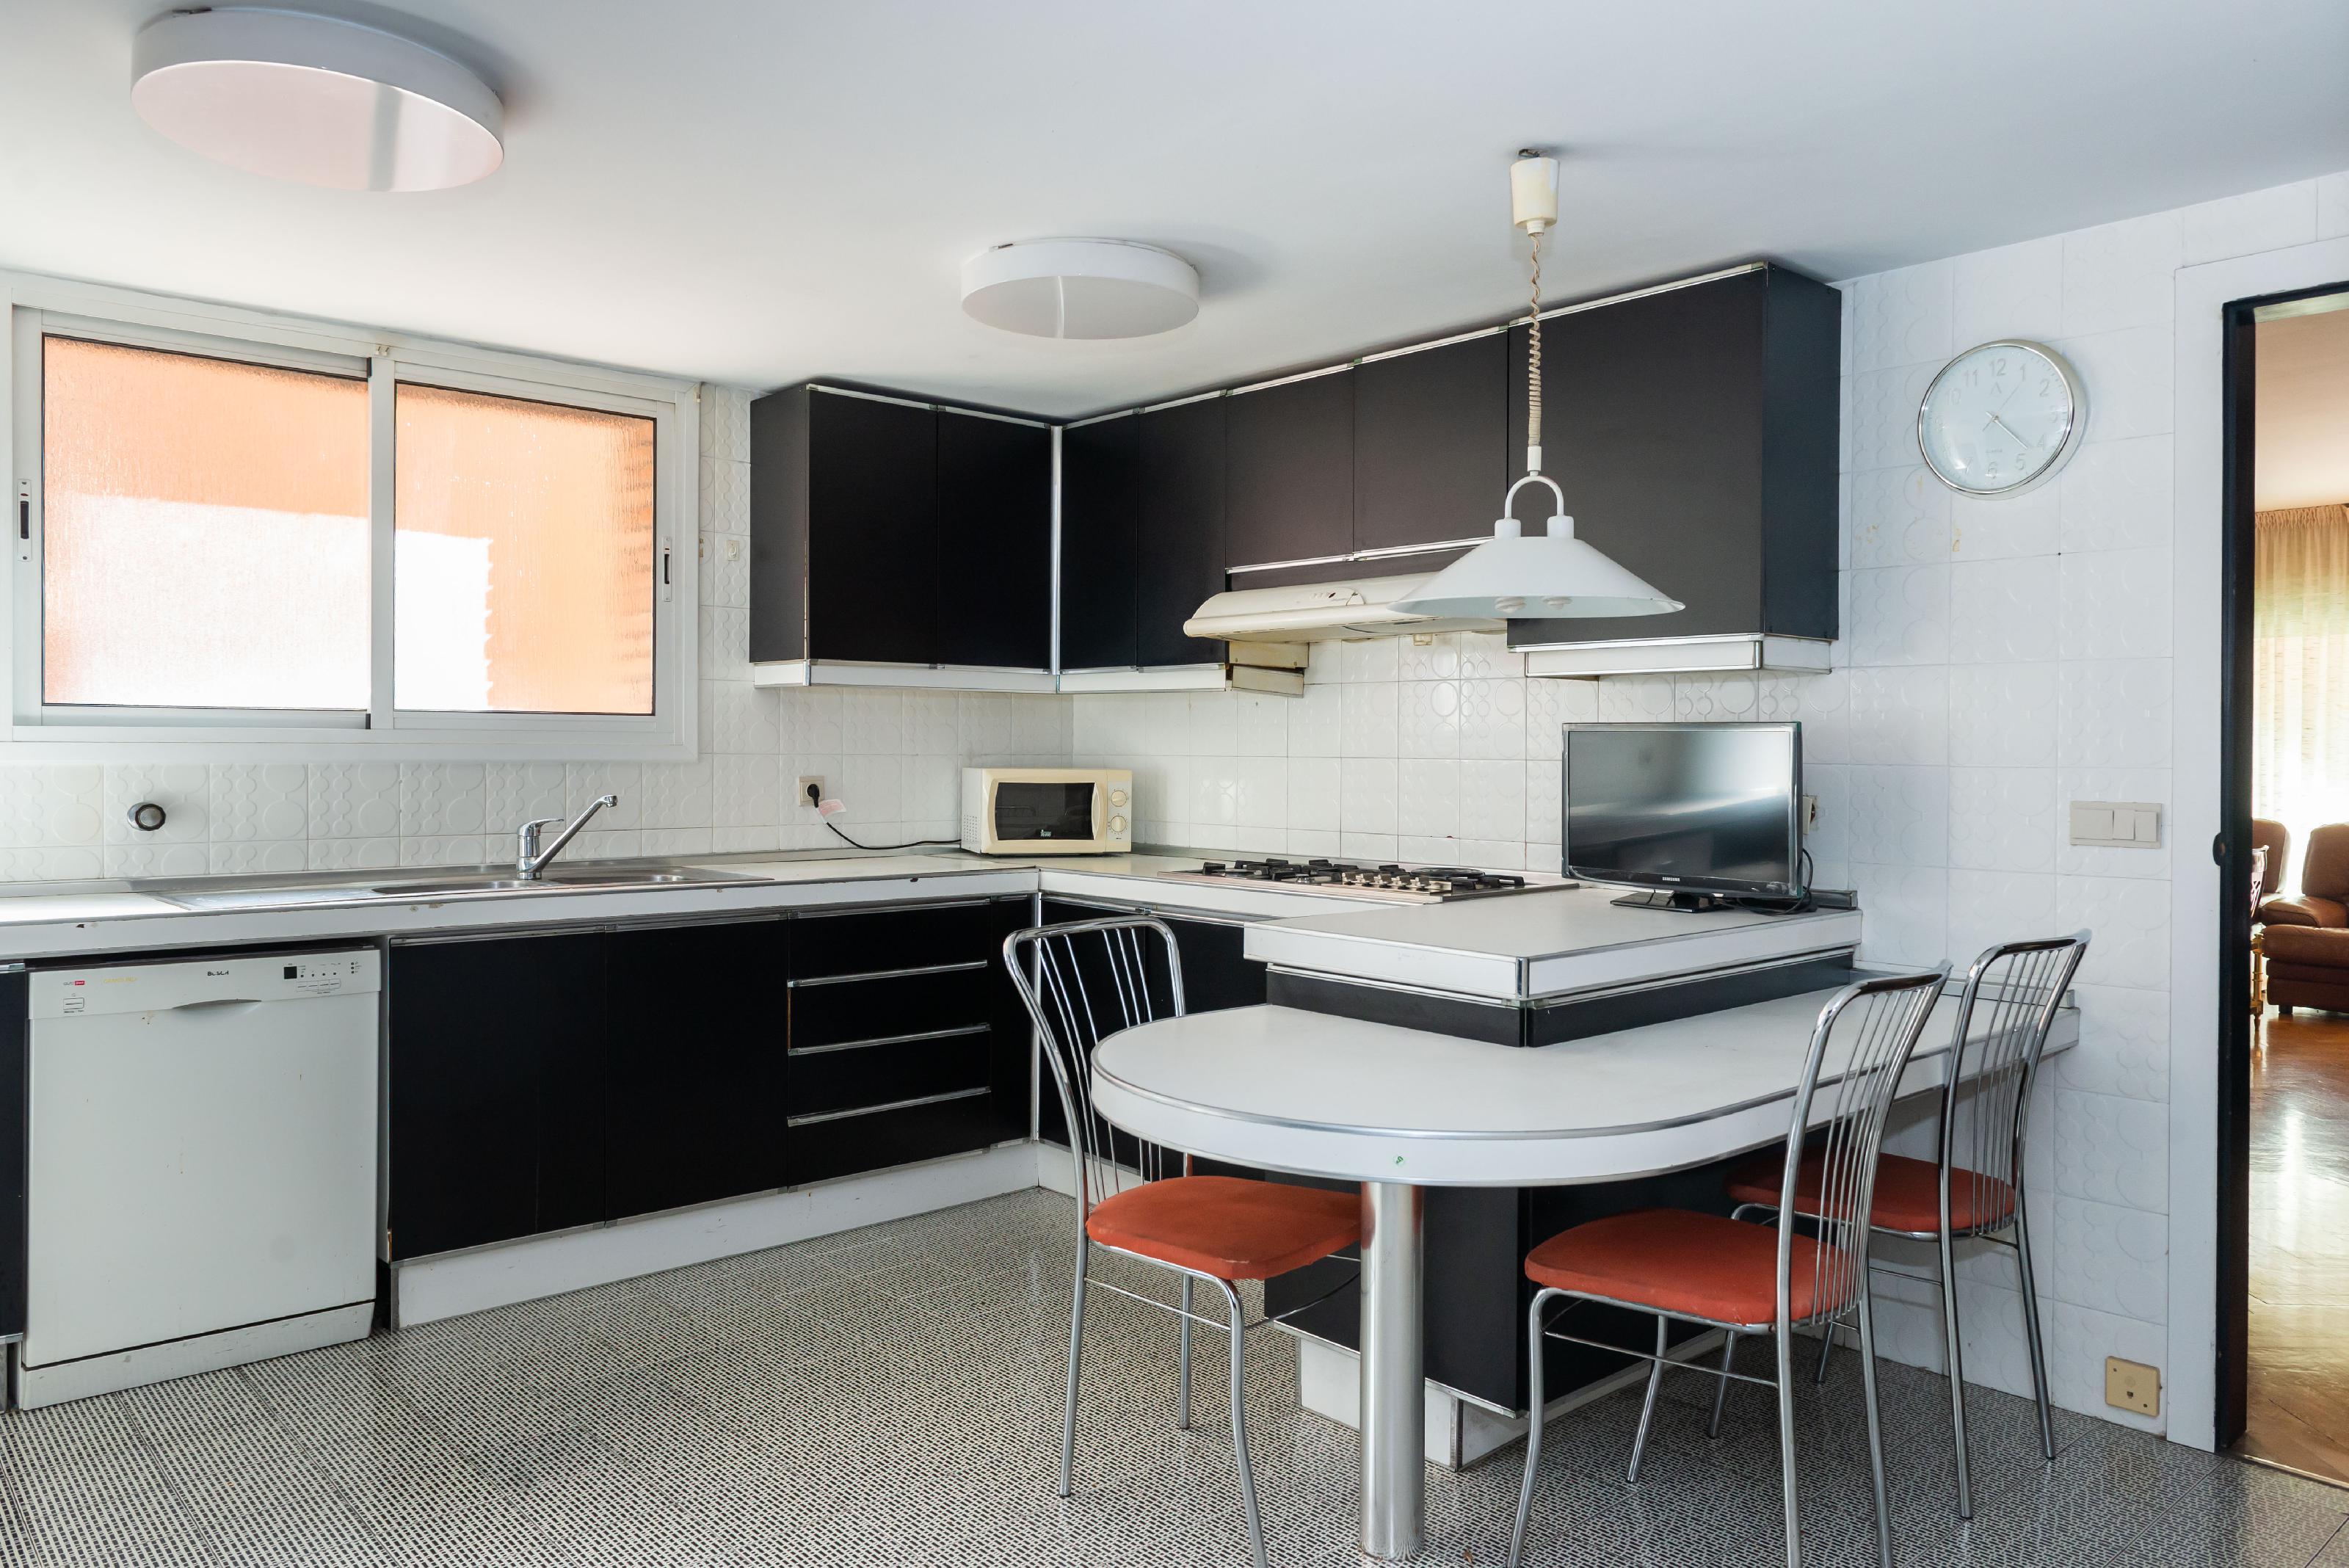 253899 Flat for sale in Sarrià-Sant Gervasi, Sant Gervasi-Galvany 14